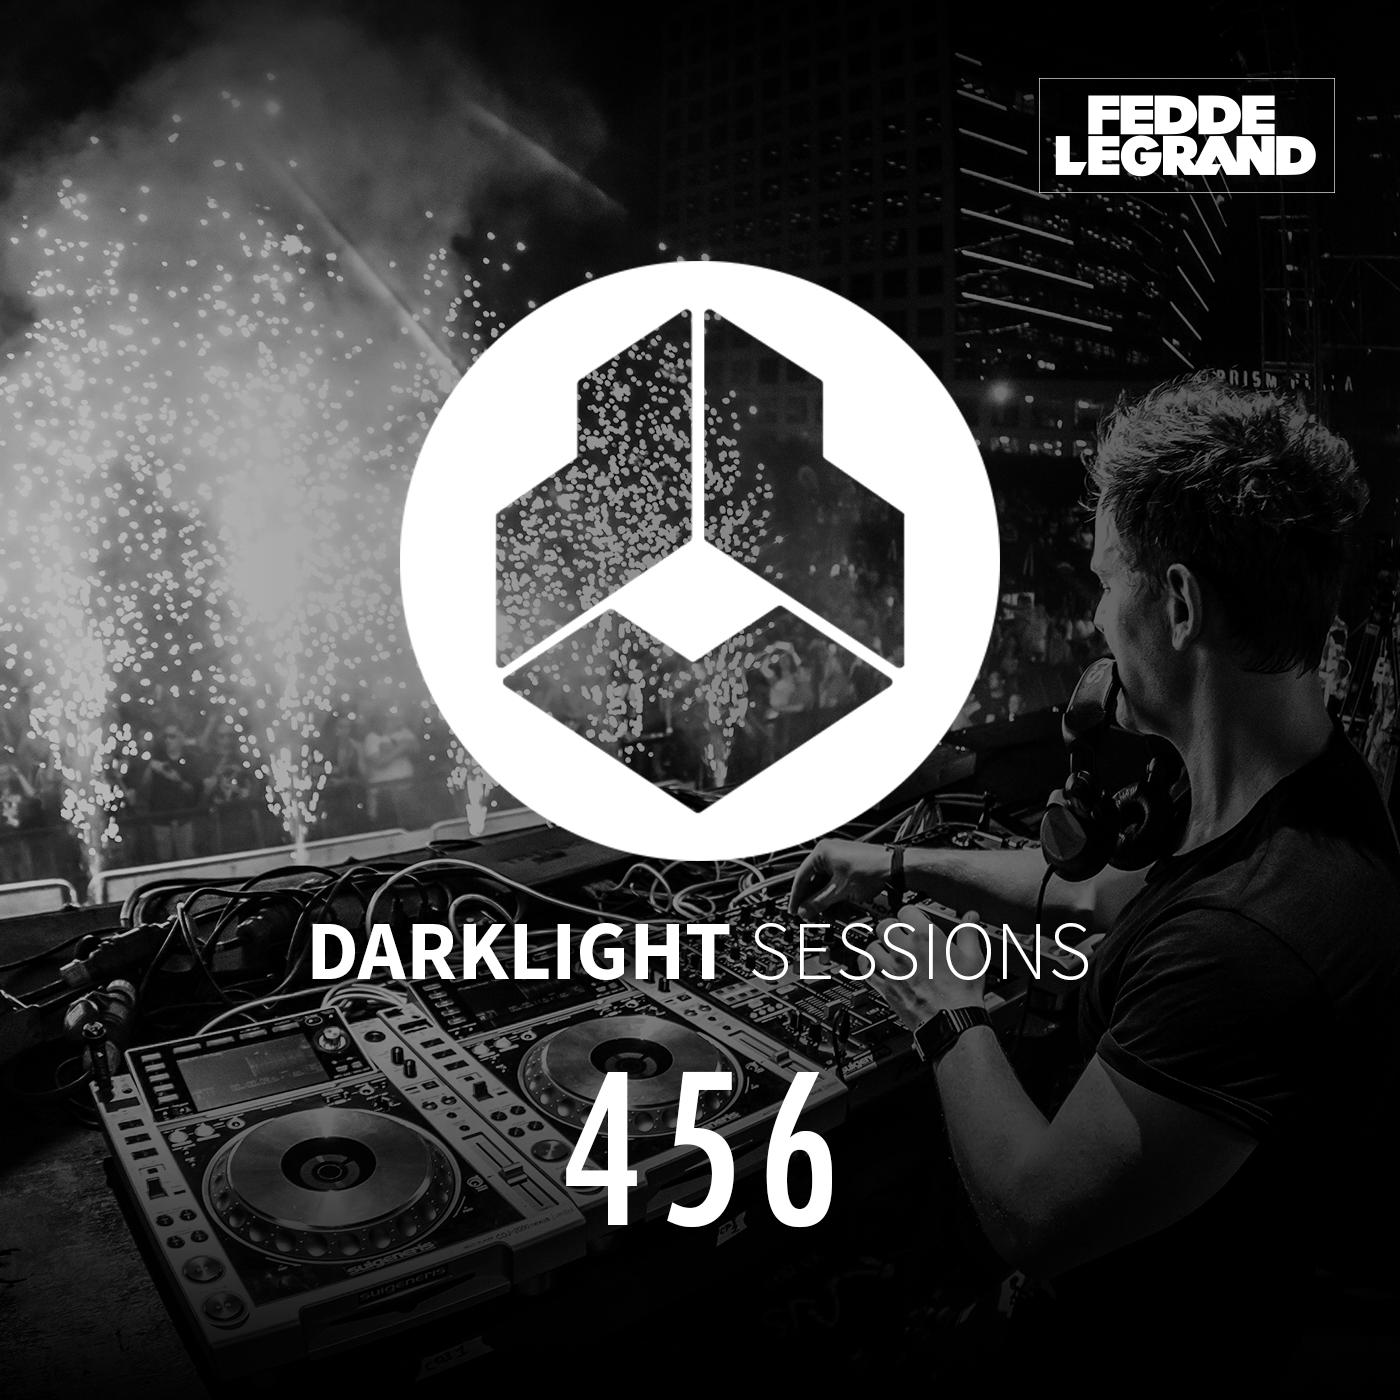 Darklight Sessions 456